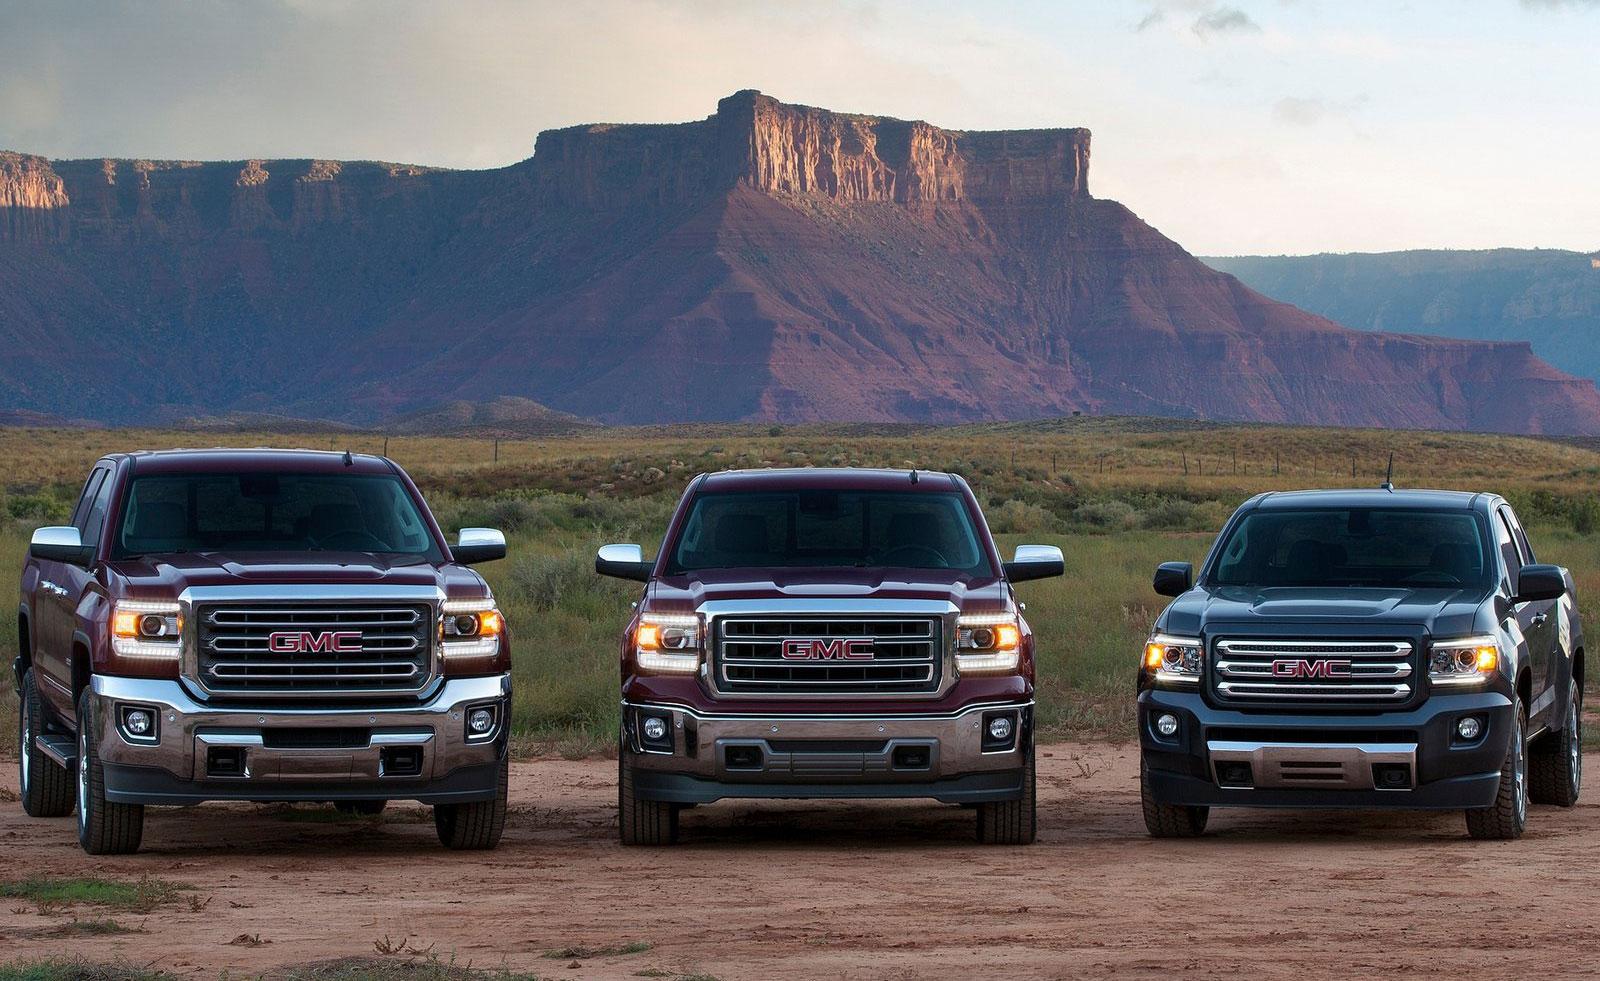 2015 GMC Canyon – macho mid-size American truck Image 221696